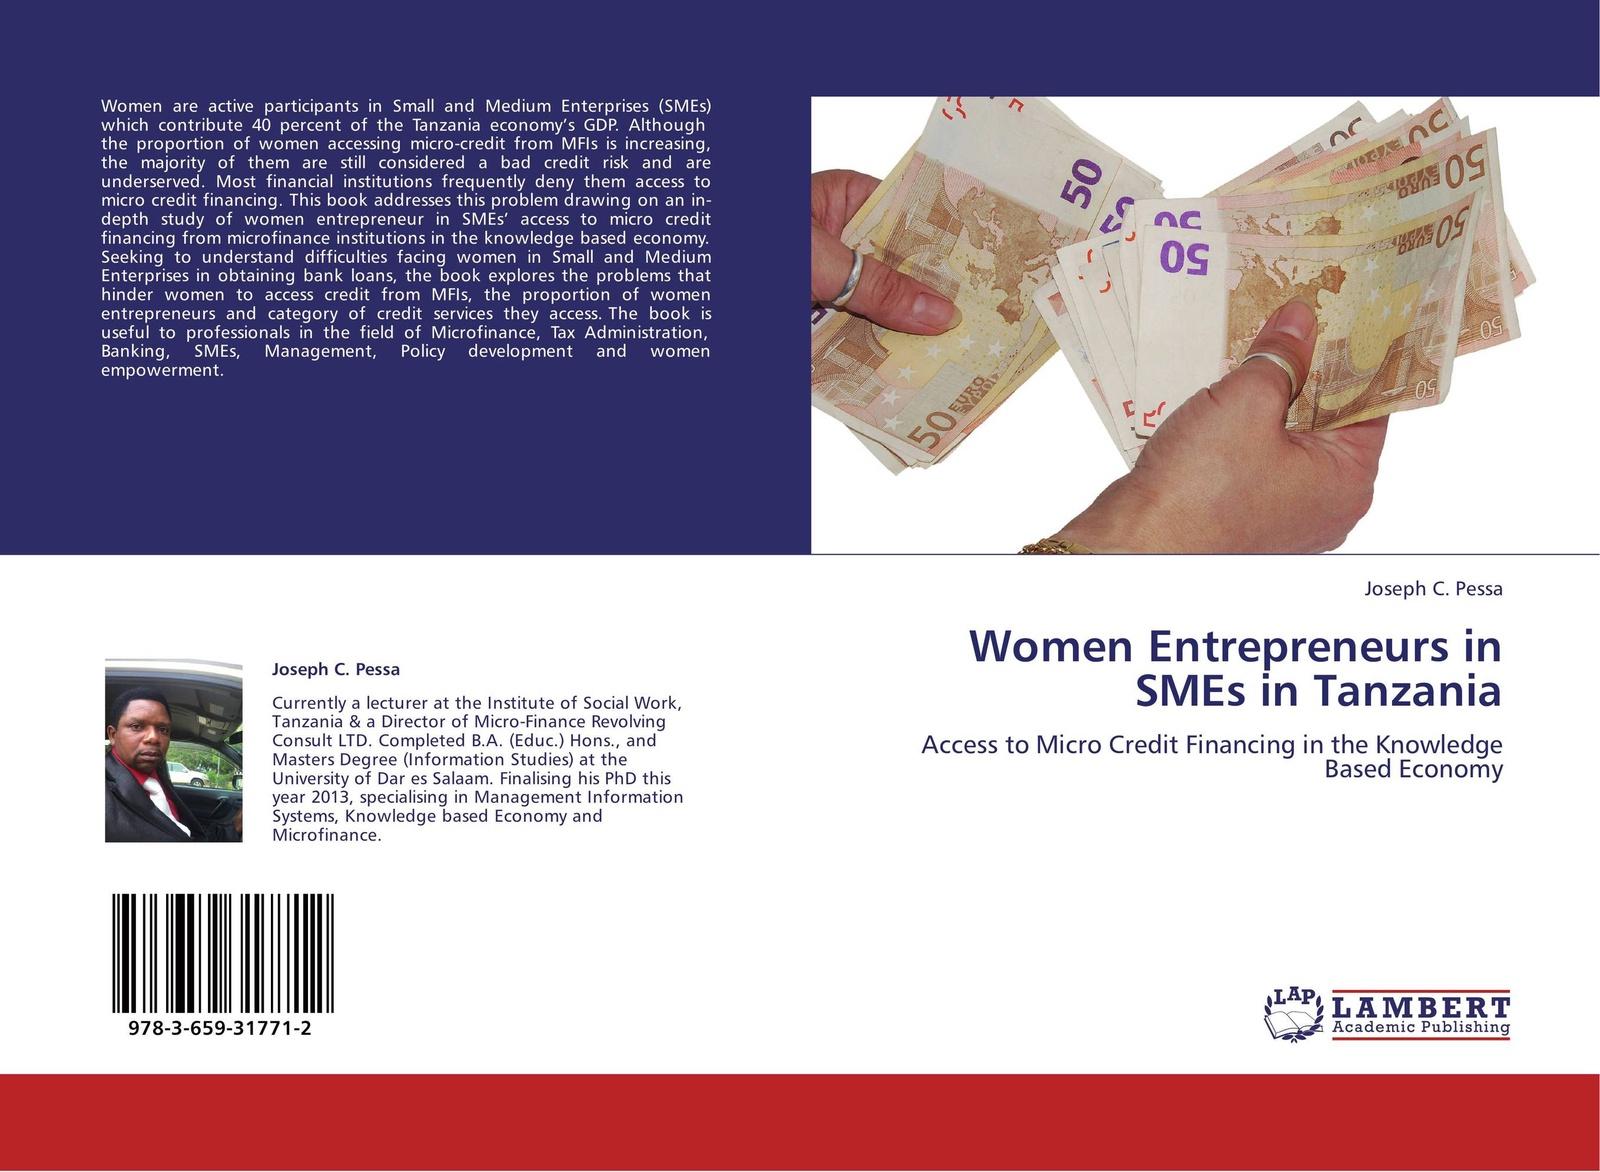 Фото - Joseph C. Pessa Women Entrepreneurs in SMEs in Tanzania sabina sultana and shaikh shamim hasan impact of micro credit on empowerment of rural women in bangladesh